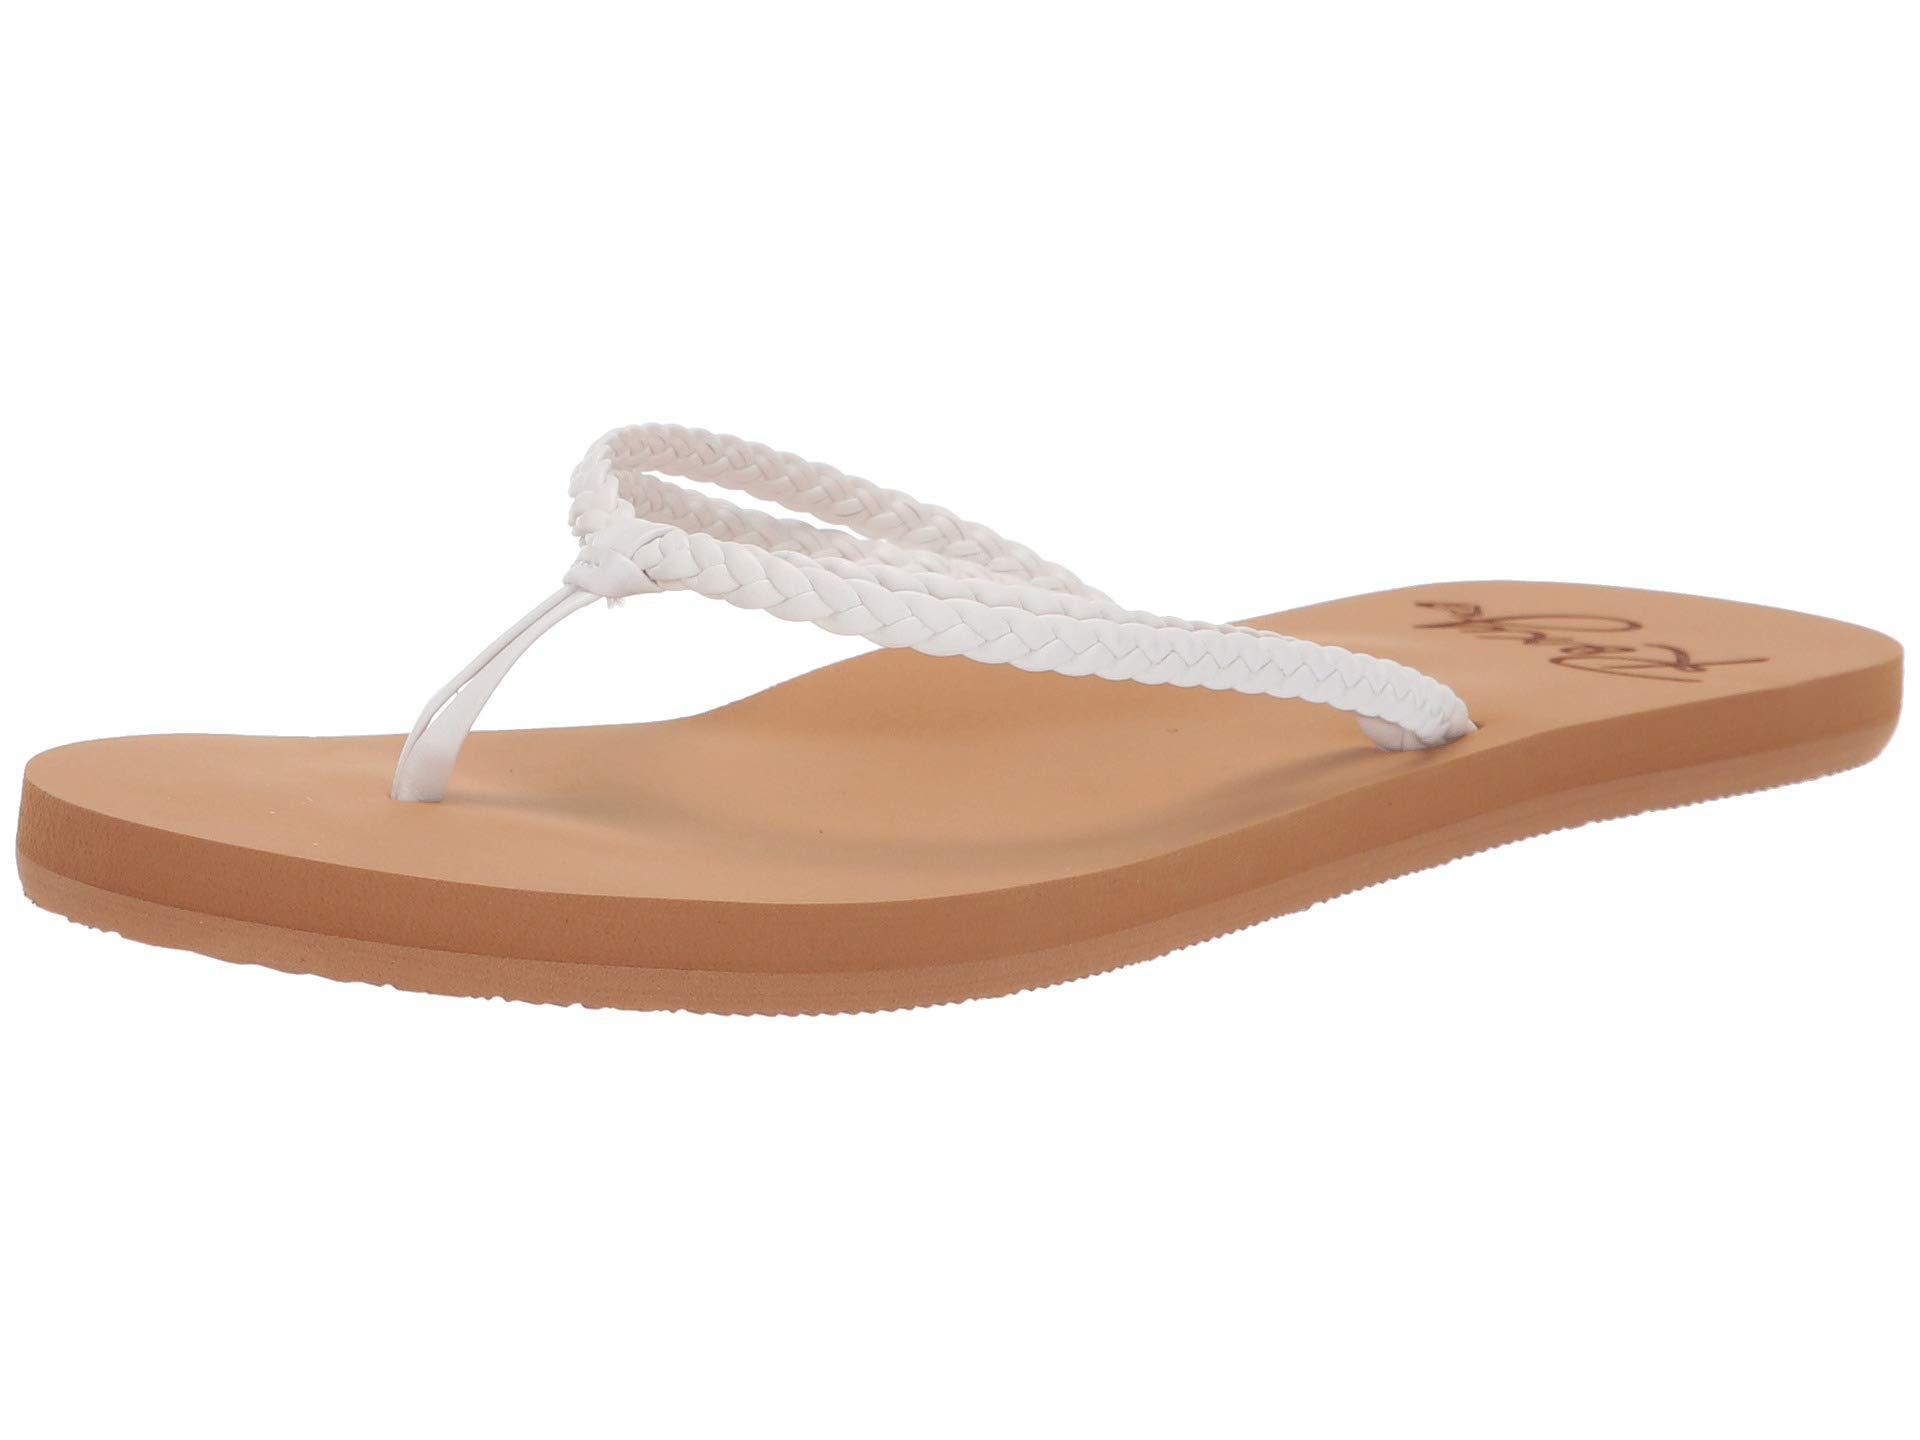 34e38794fcd0 Roxy - White Costas (cream) Women s Sandals - Lyst. View fullscreen